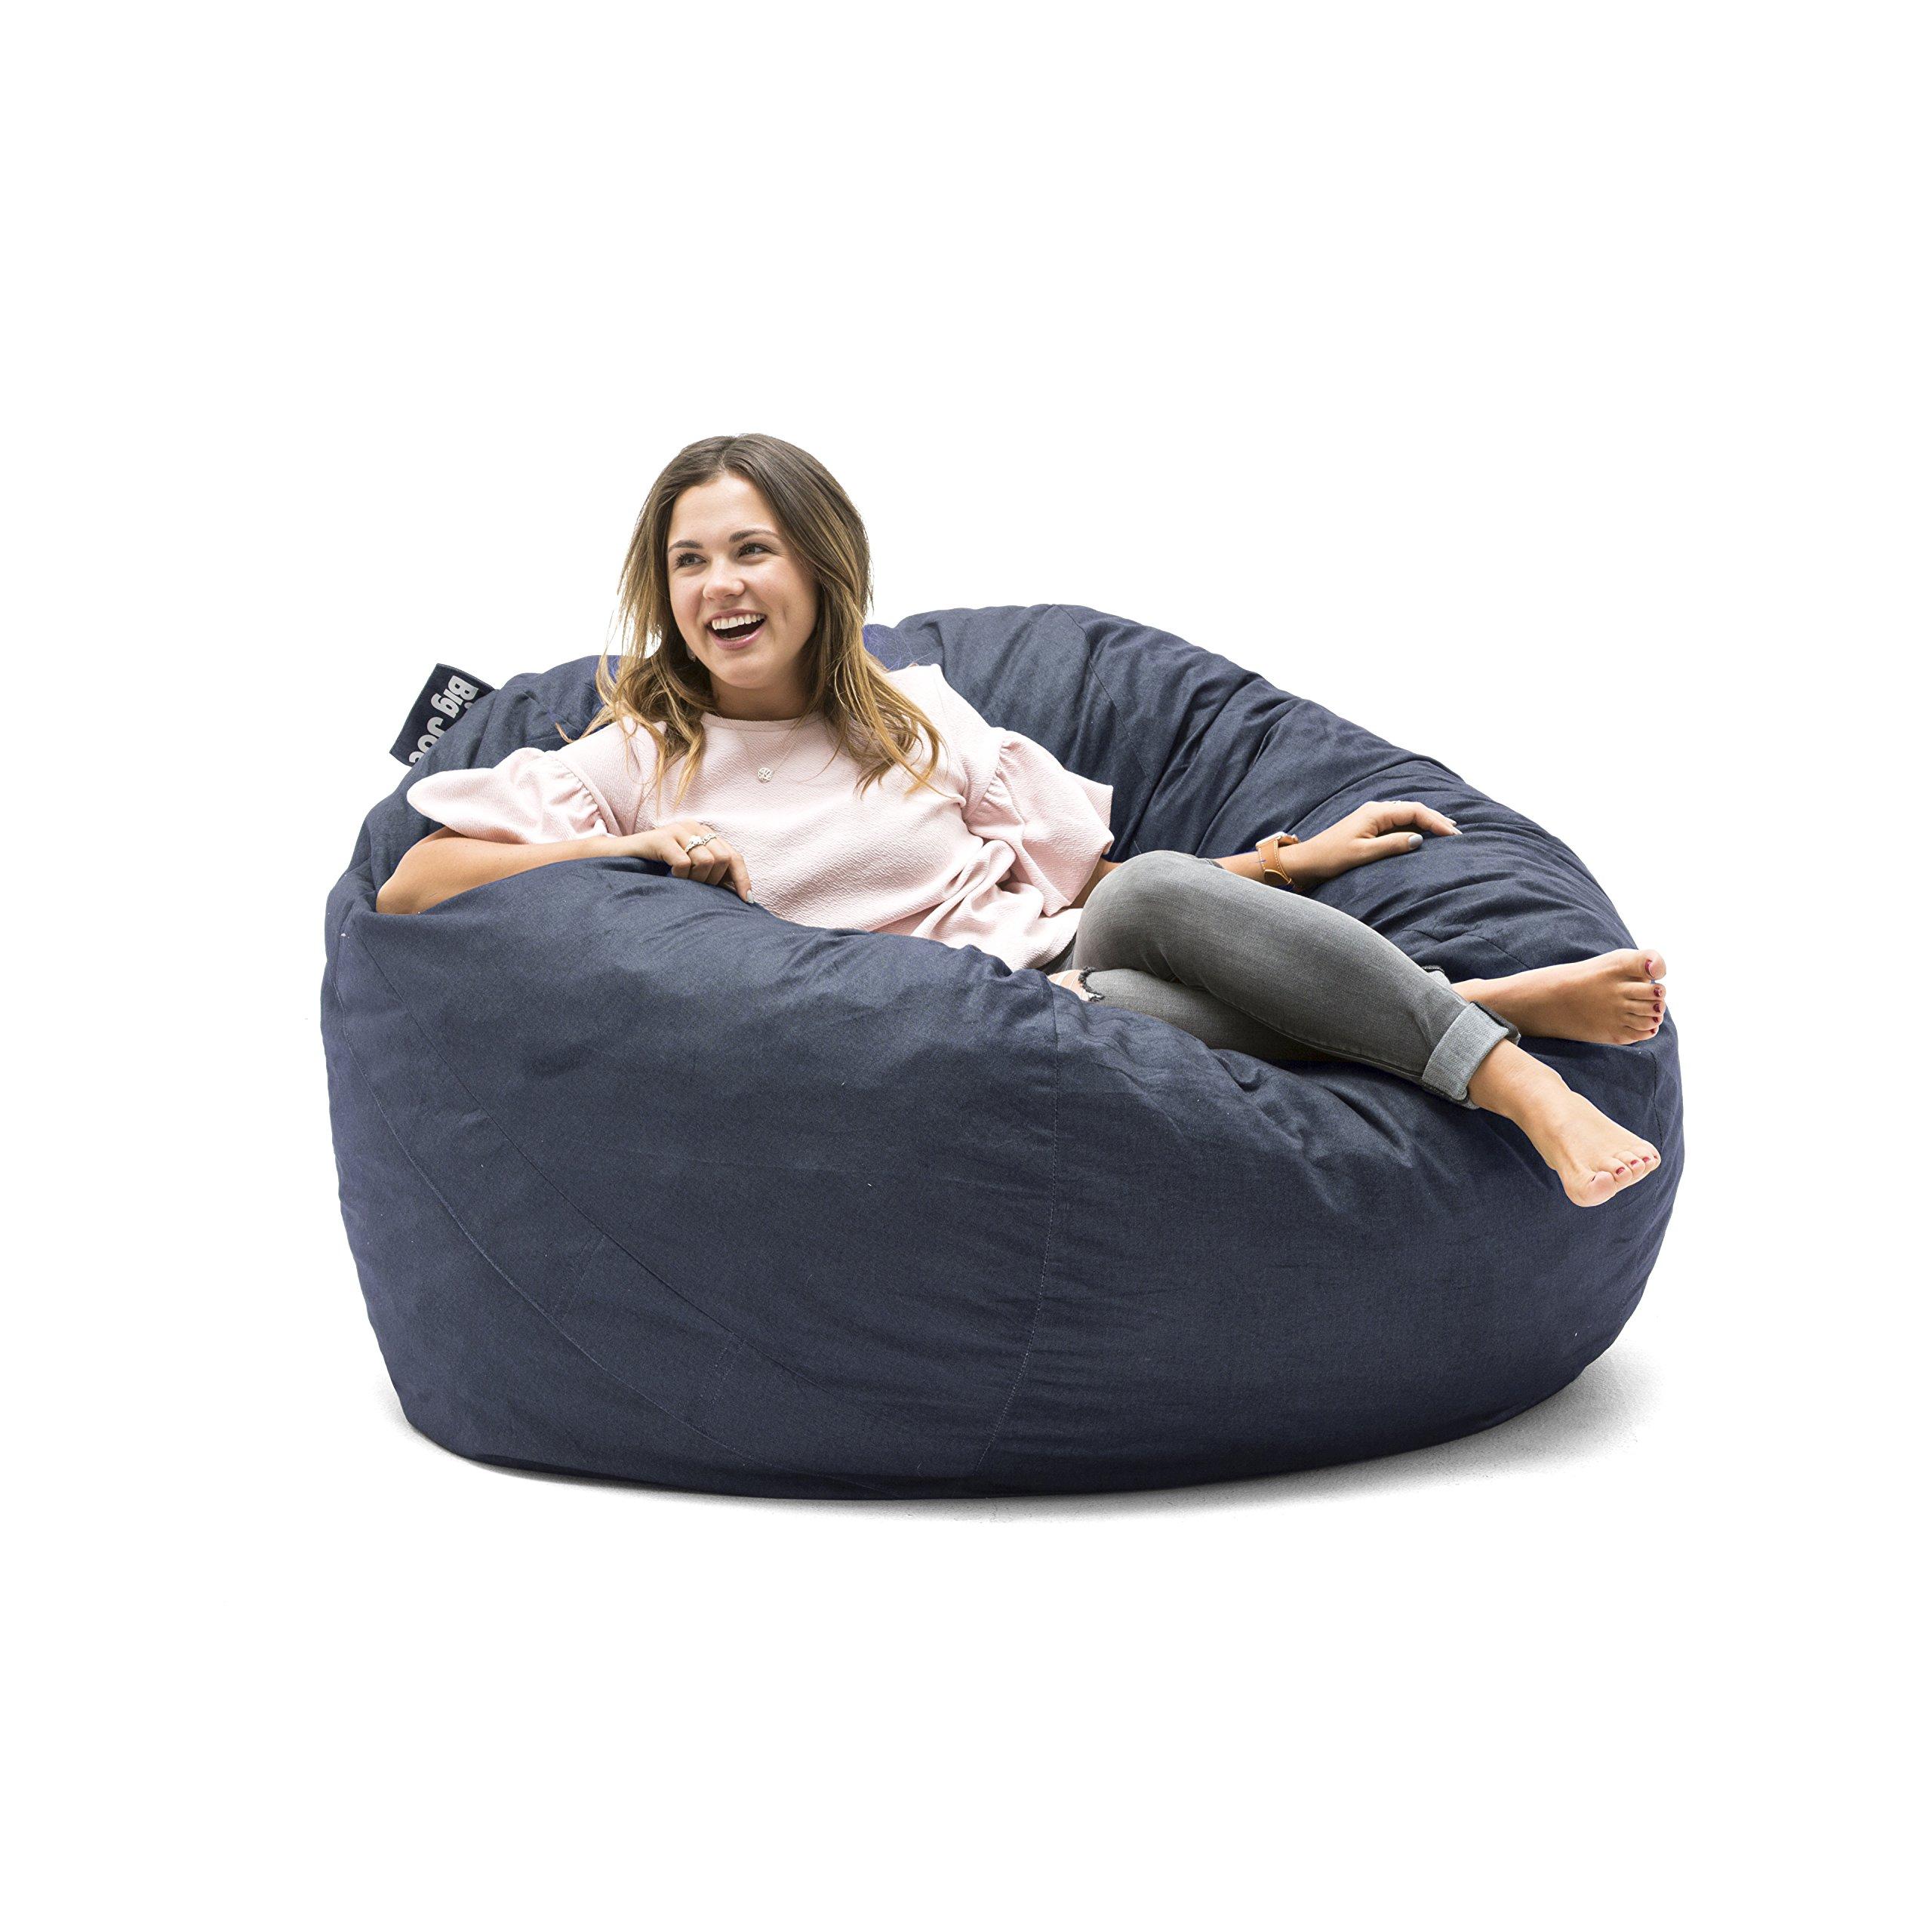 Big Joe 0010657 Fuf Foam Filled Bean Bag Chair, Large, Cobalt Lenox by Big Joe